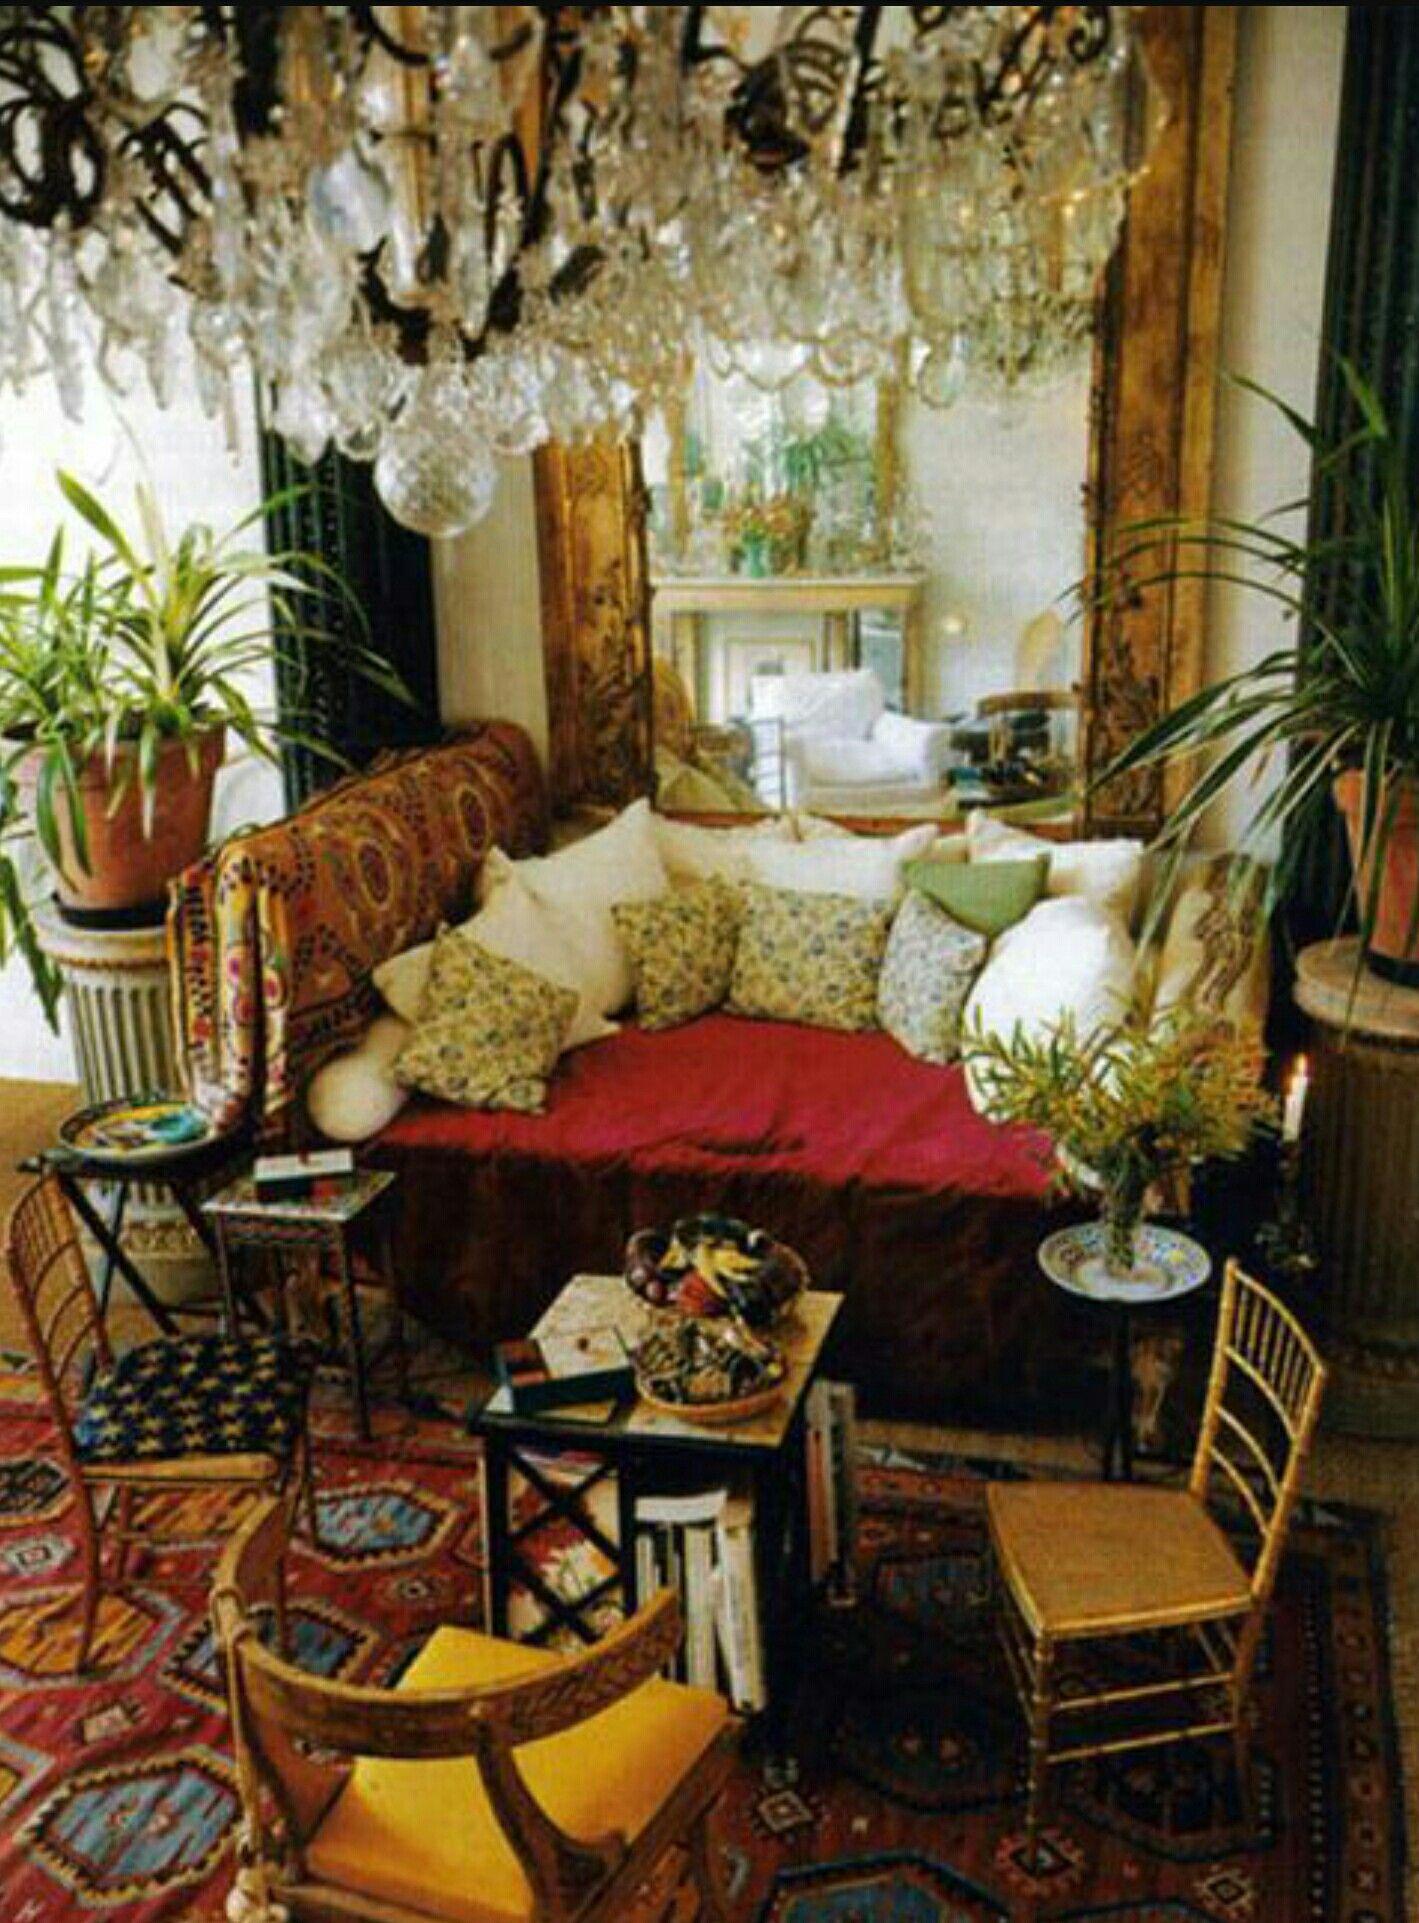 pin by megan mcilmail on dream house modern interior decor boho chic living room decor on boho chic decor living room bohemian kitchen id=53613